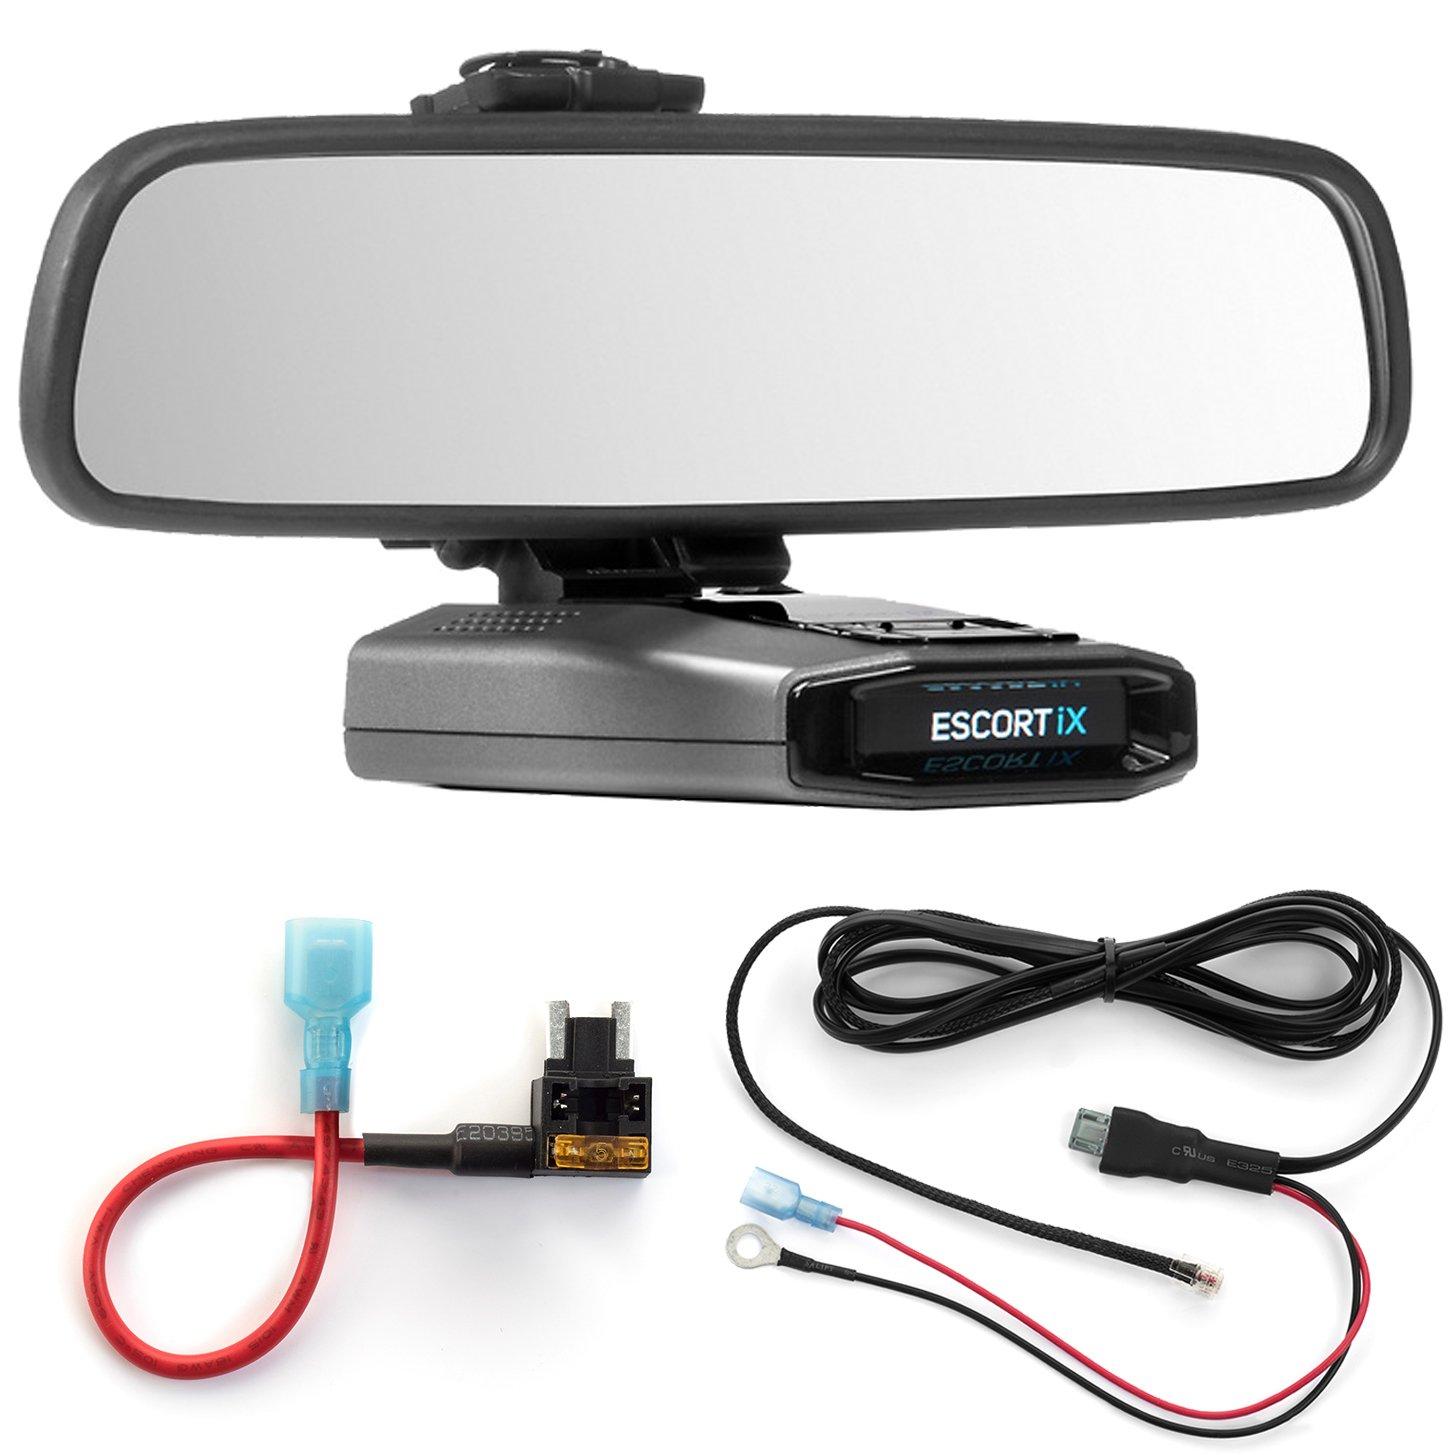 Radar Mount Mirror Mount Micro Fuse Tap Escort IX EX Max360C 3001507 Direct Wire Power Cord